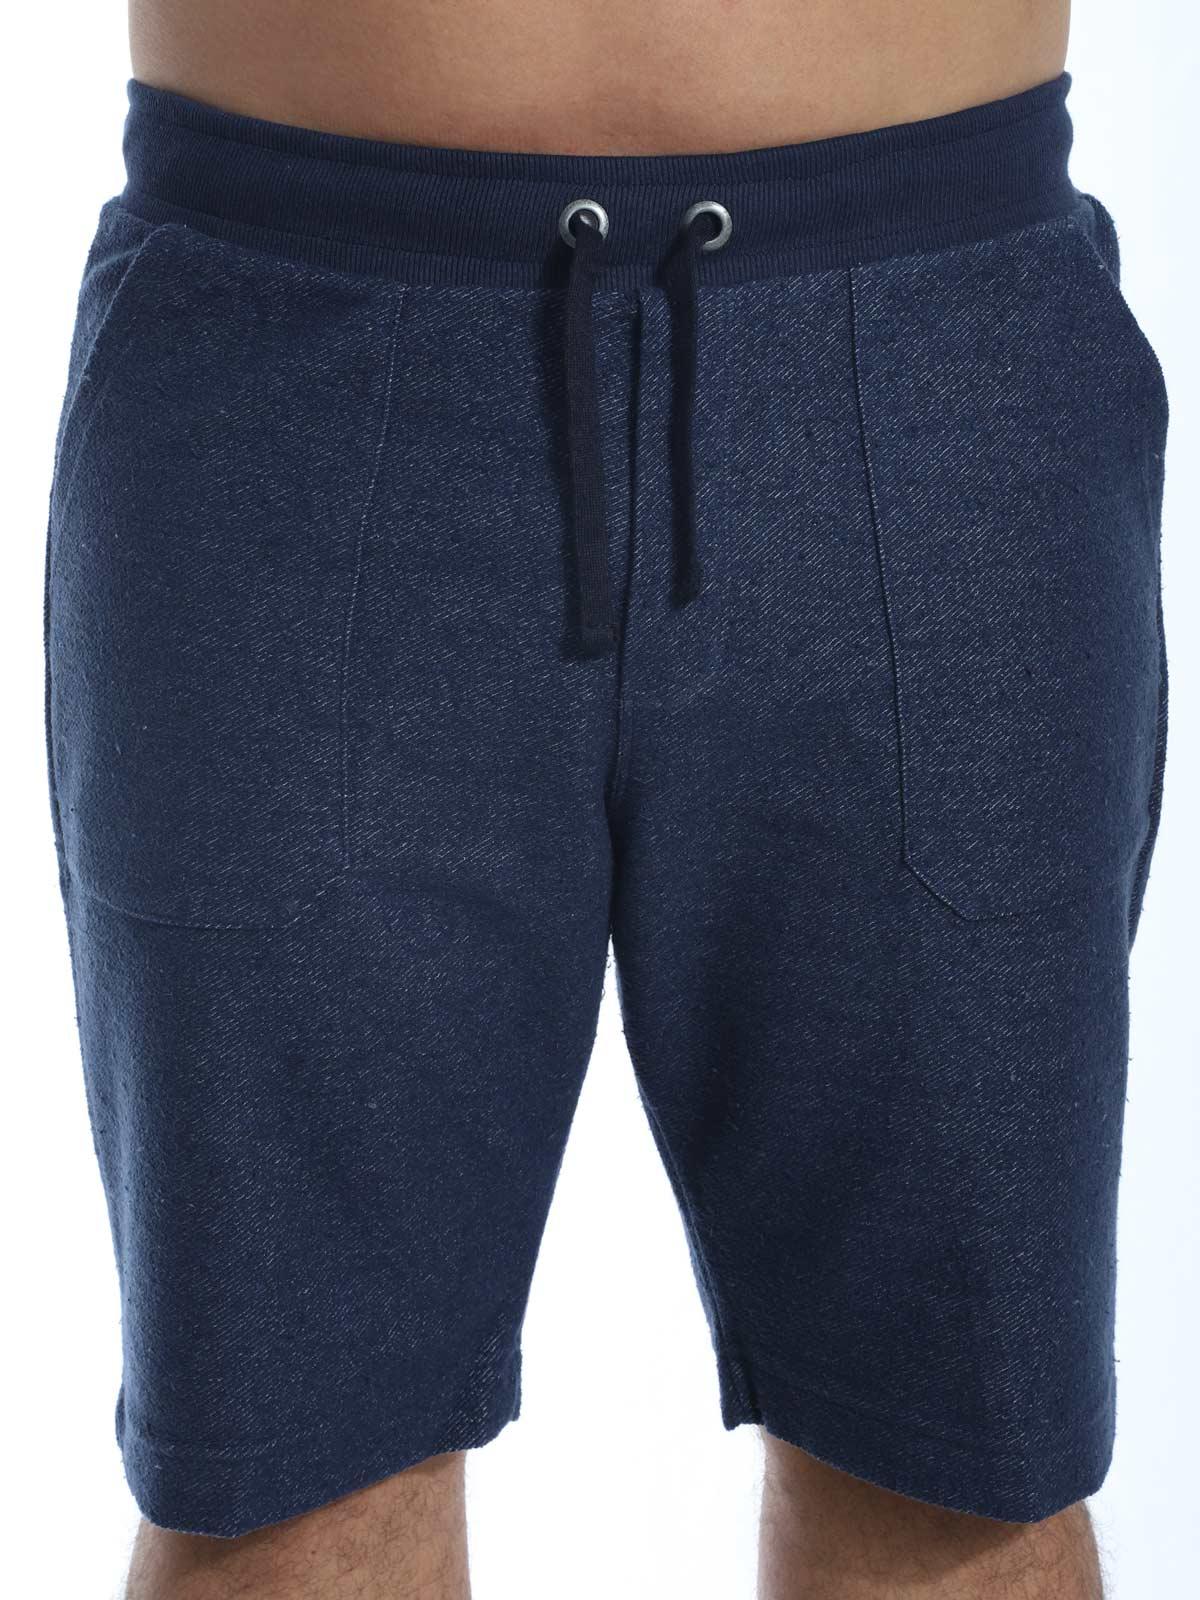 Bermuda Anistia Moleton Bio Jeans